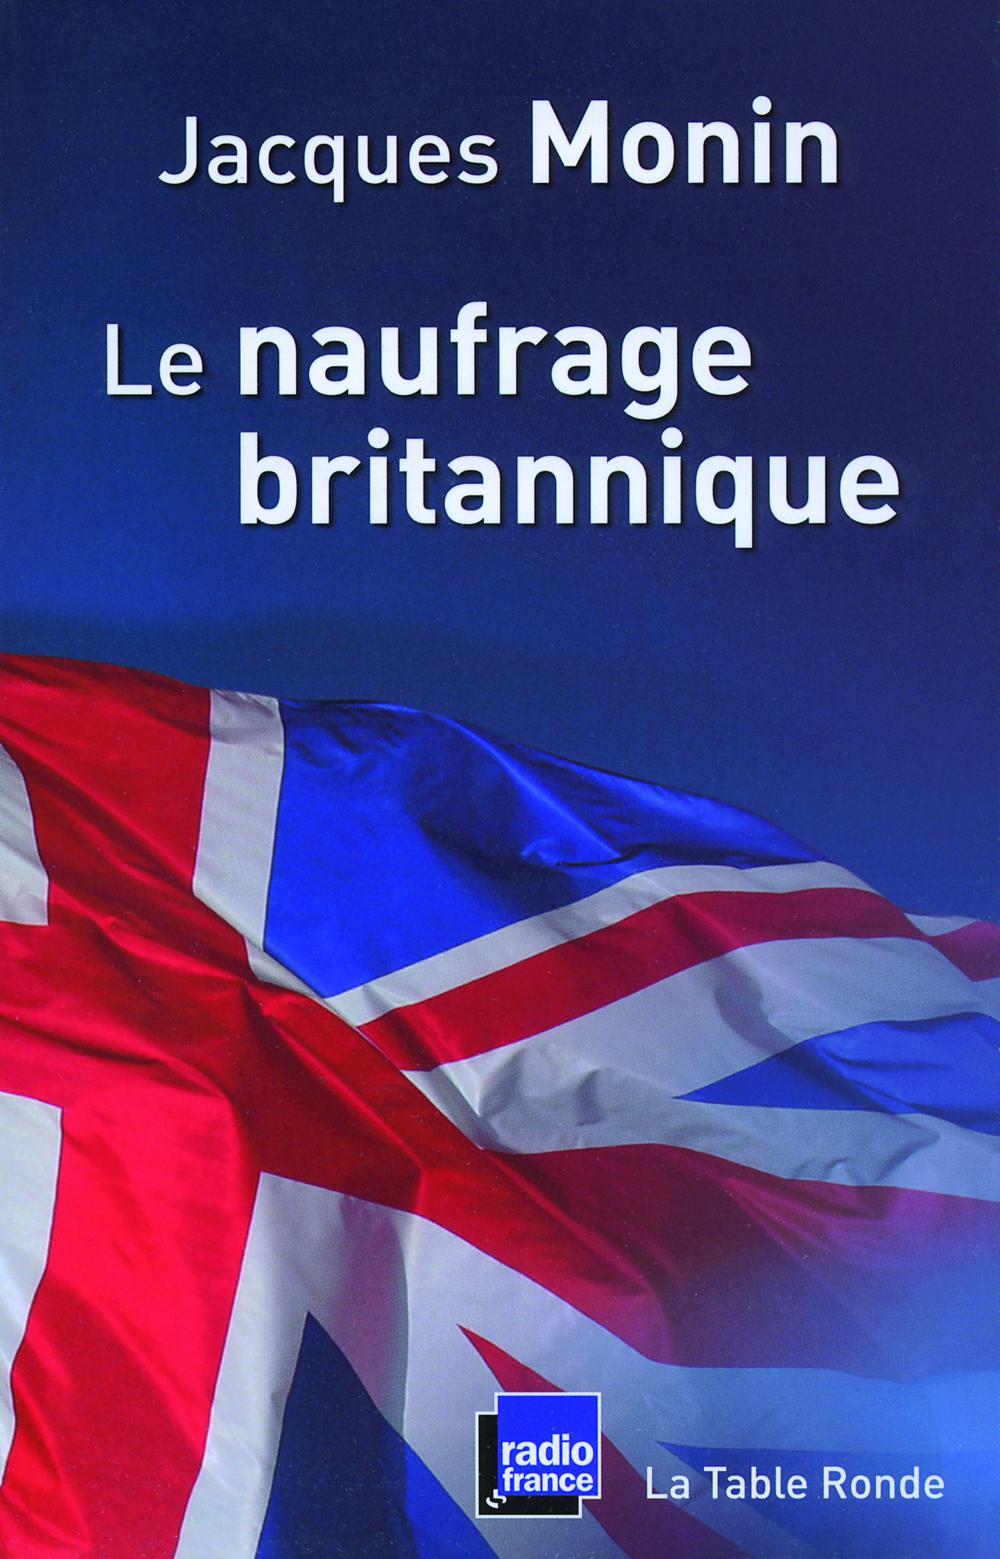 Le naufrage britannique